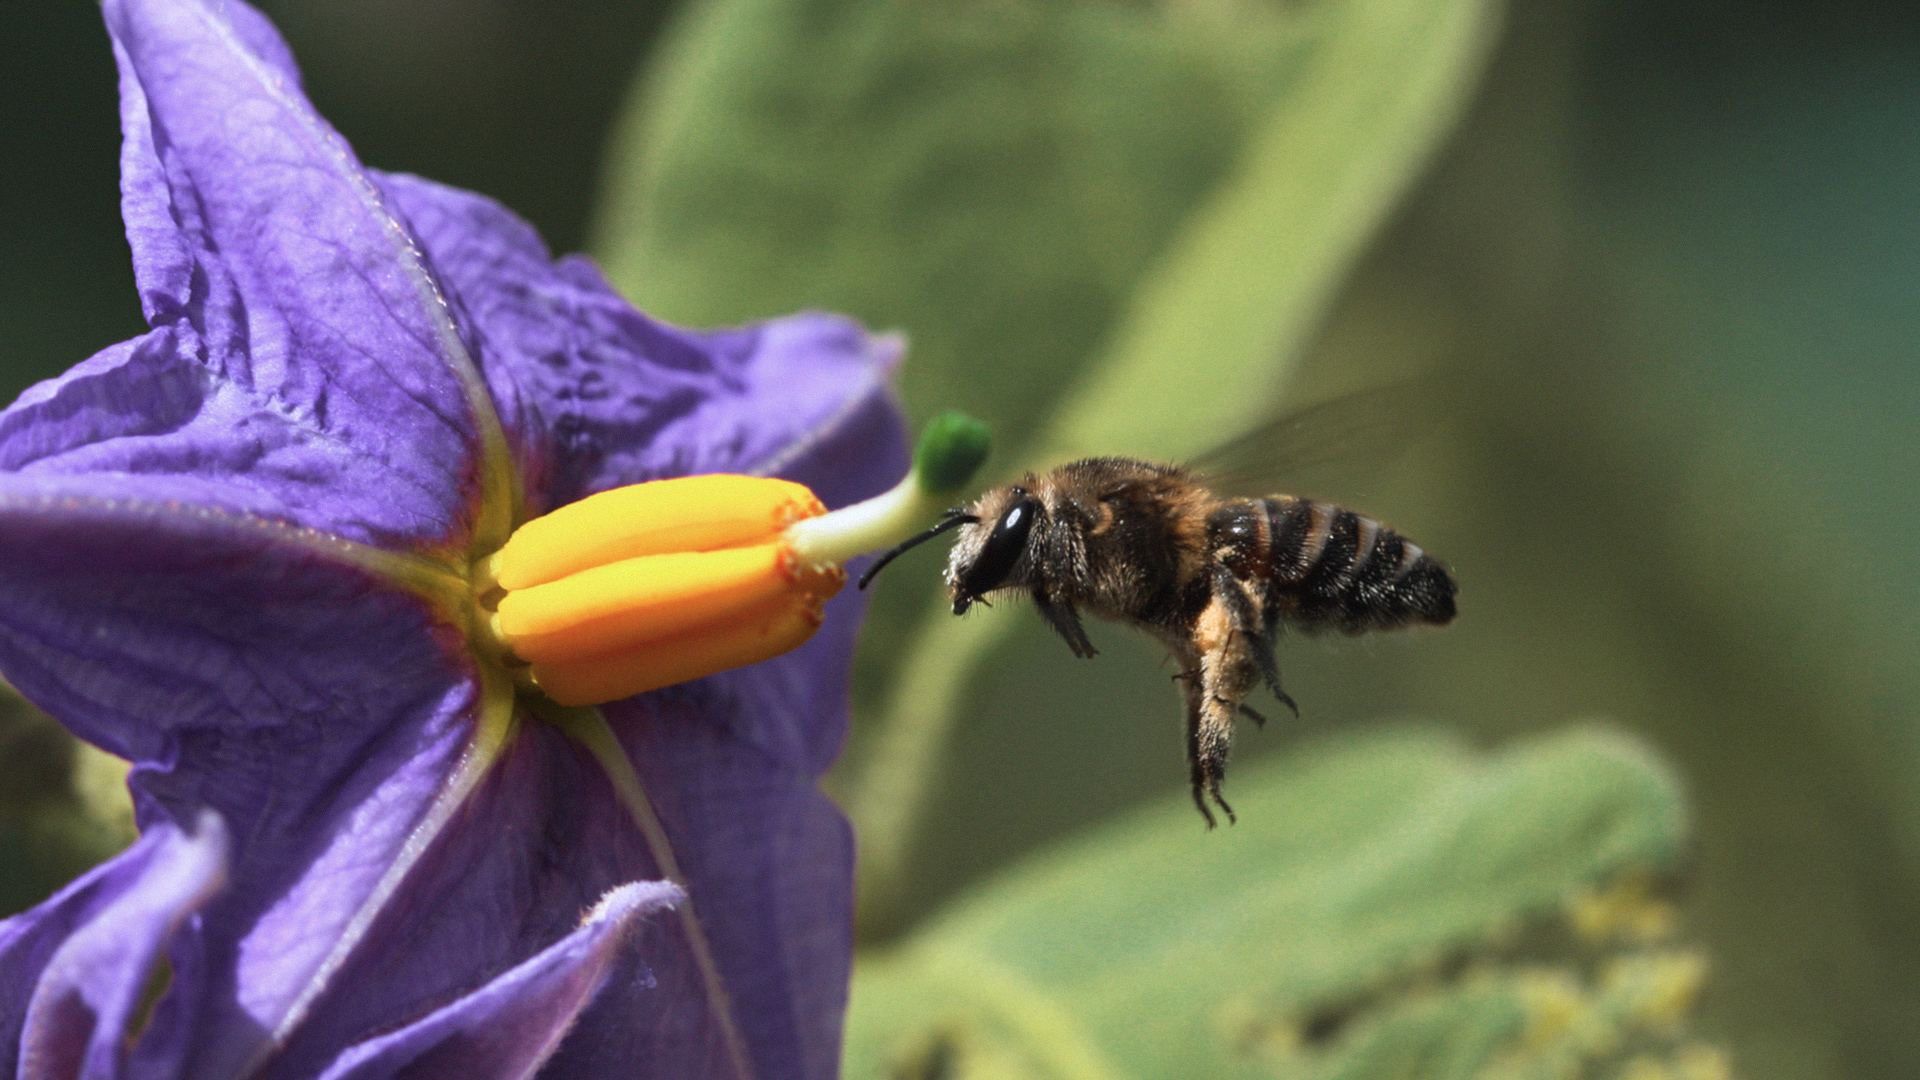 Dino Martins Fighting for **pollinators**